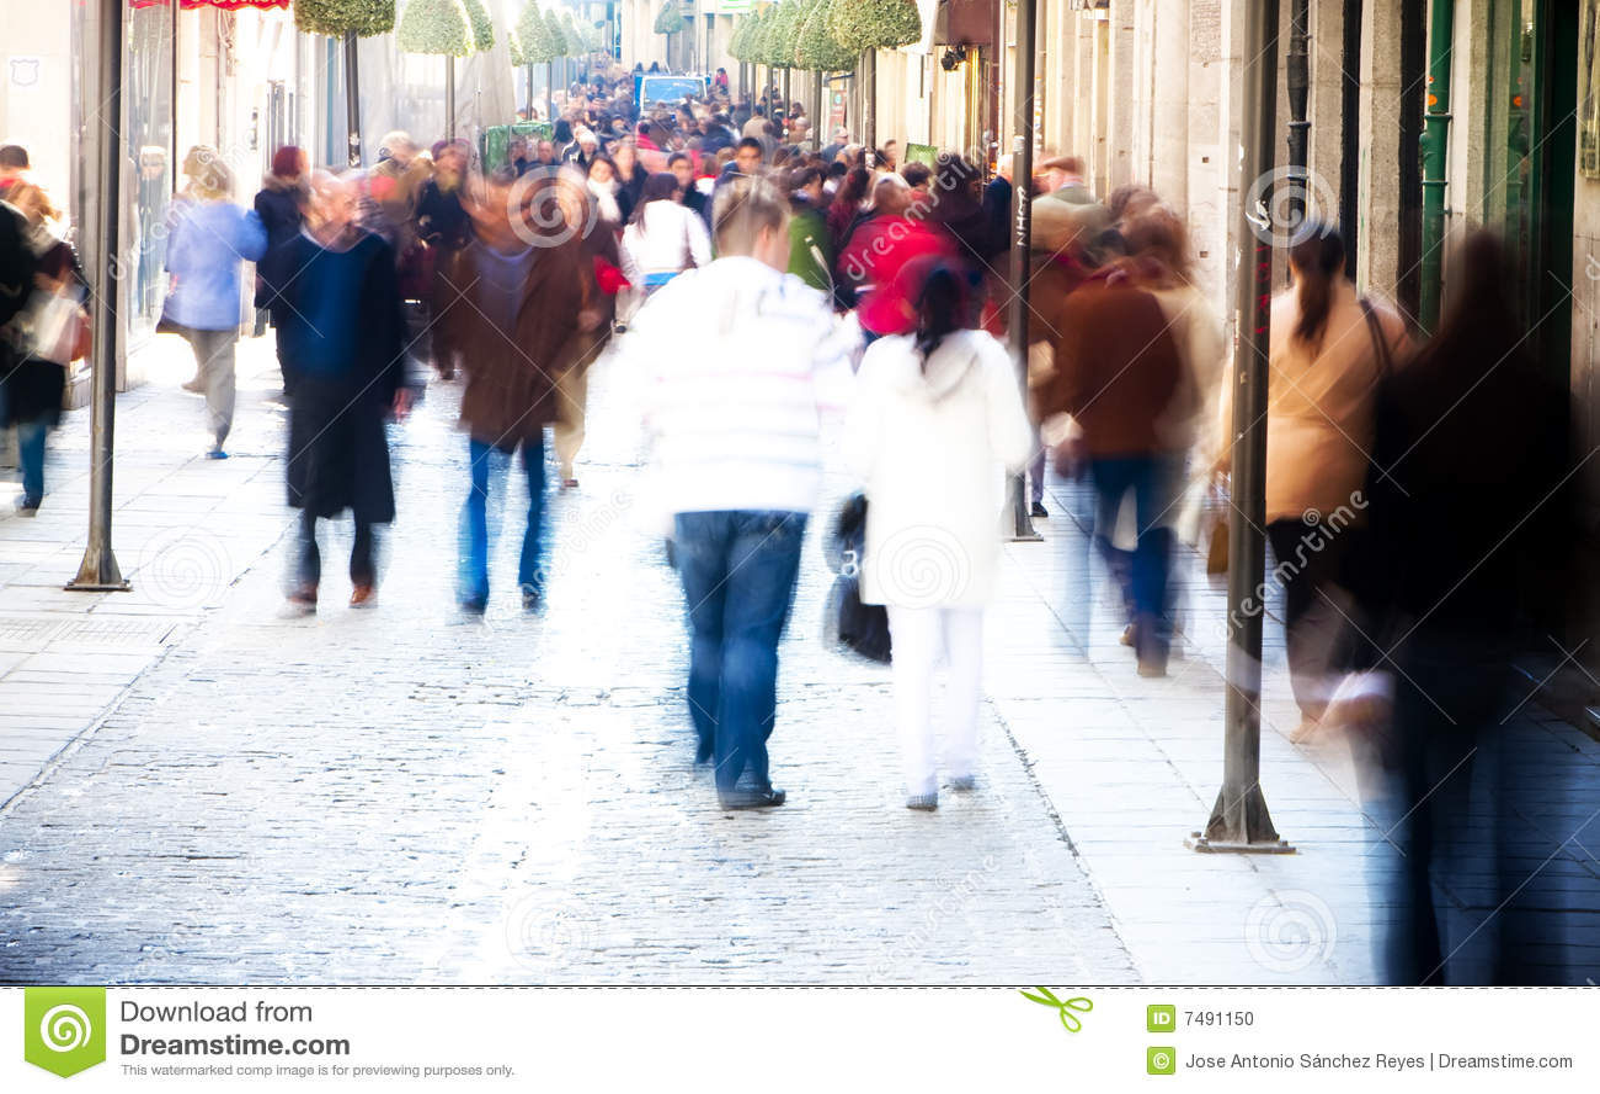 Blurred People Stock Photo - Image: 7491150